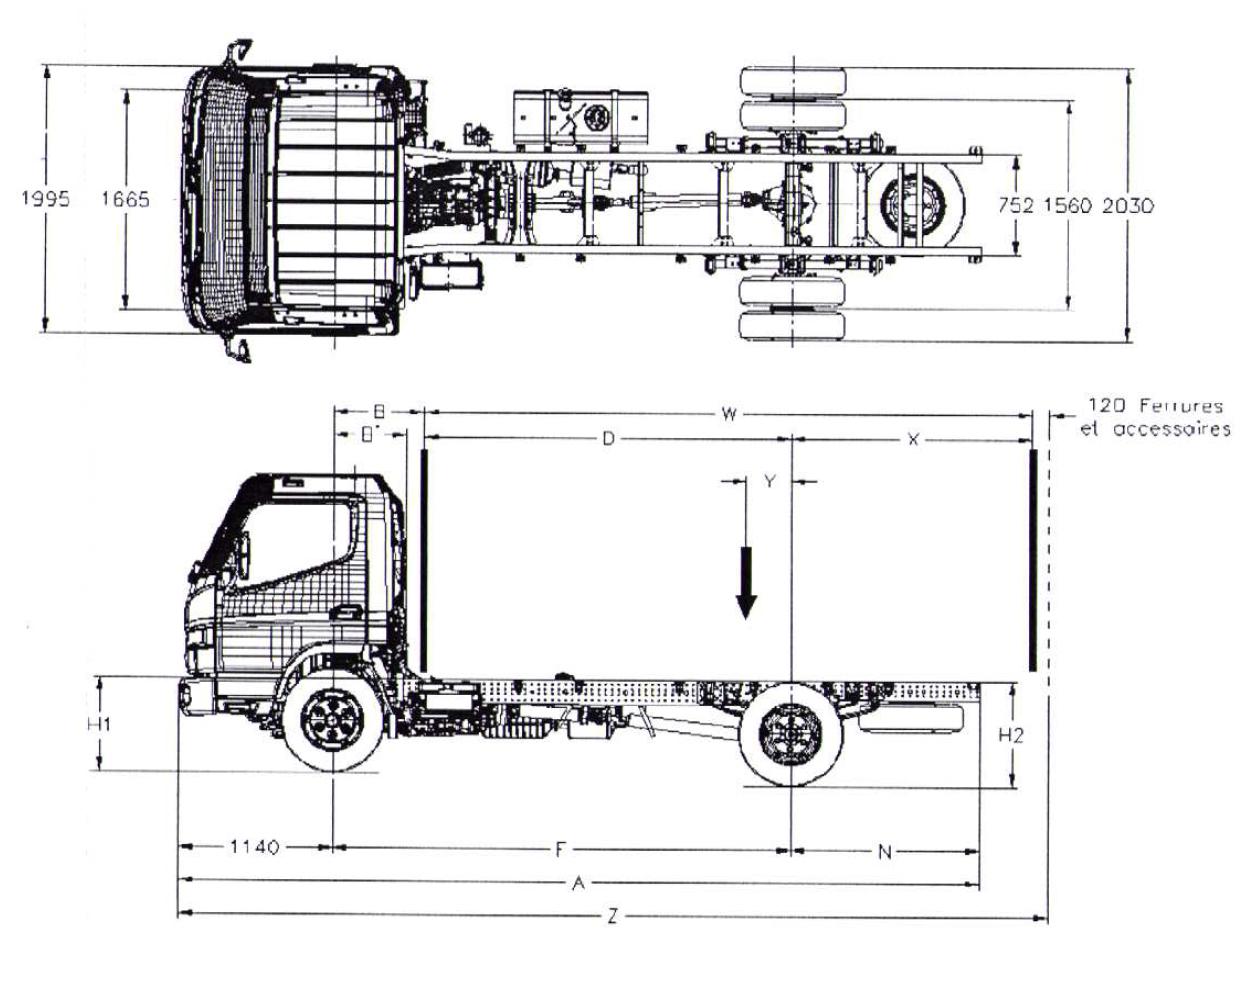 camion 7 5 tonnes baudelet environnement. Black Bedroom Furniture Sets. Home Design Ideas